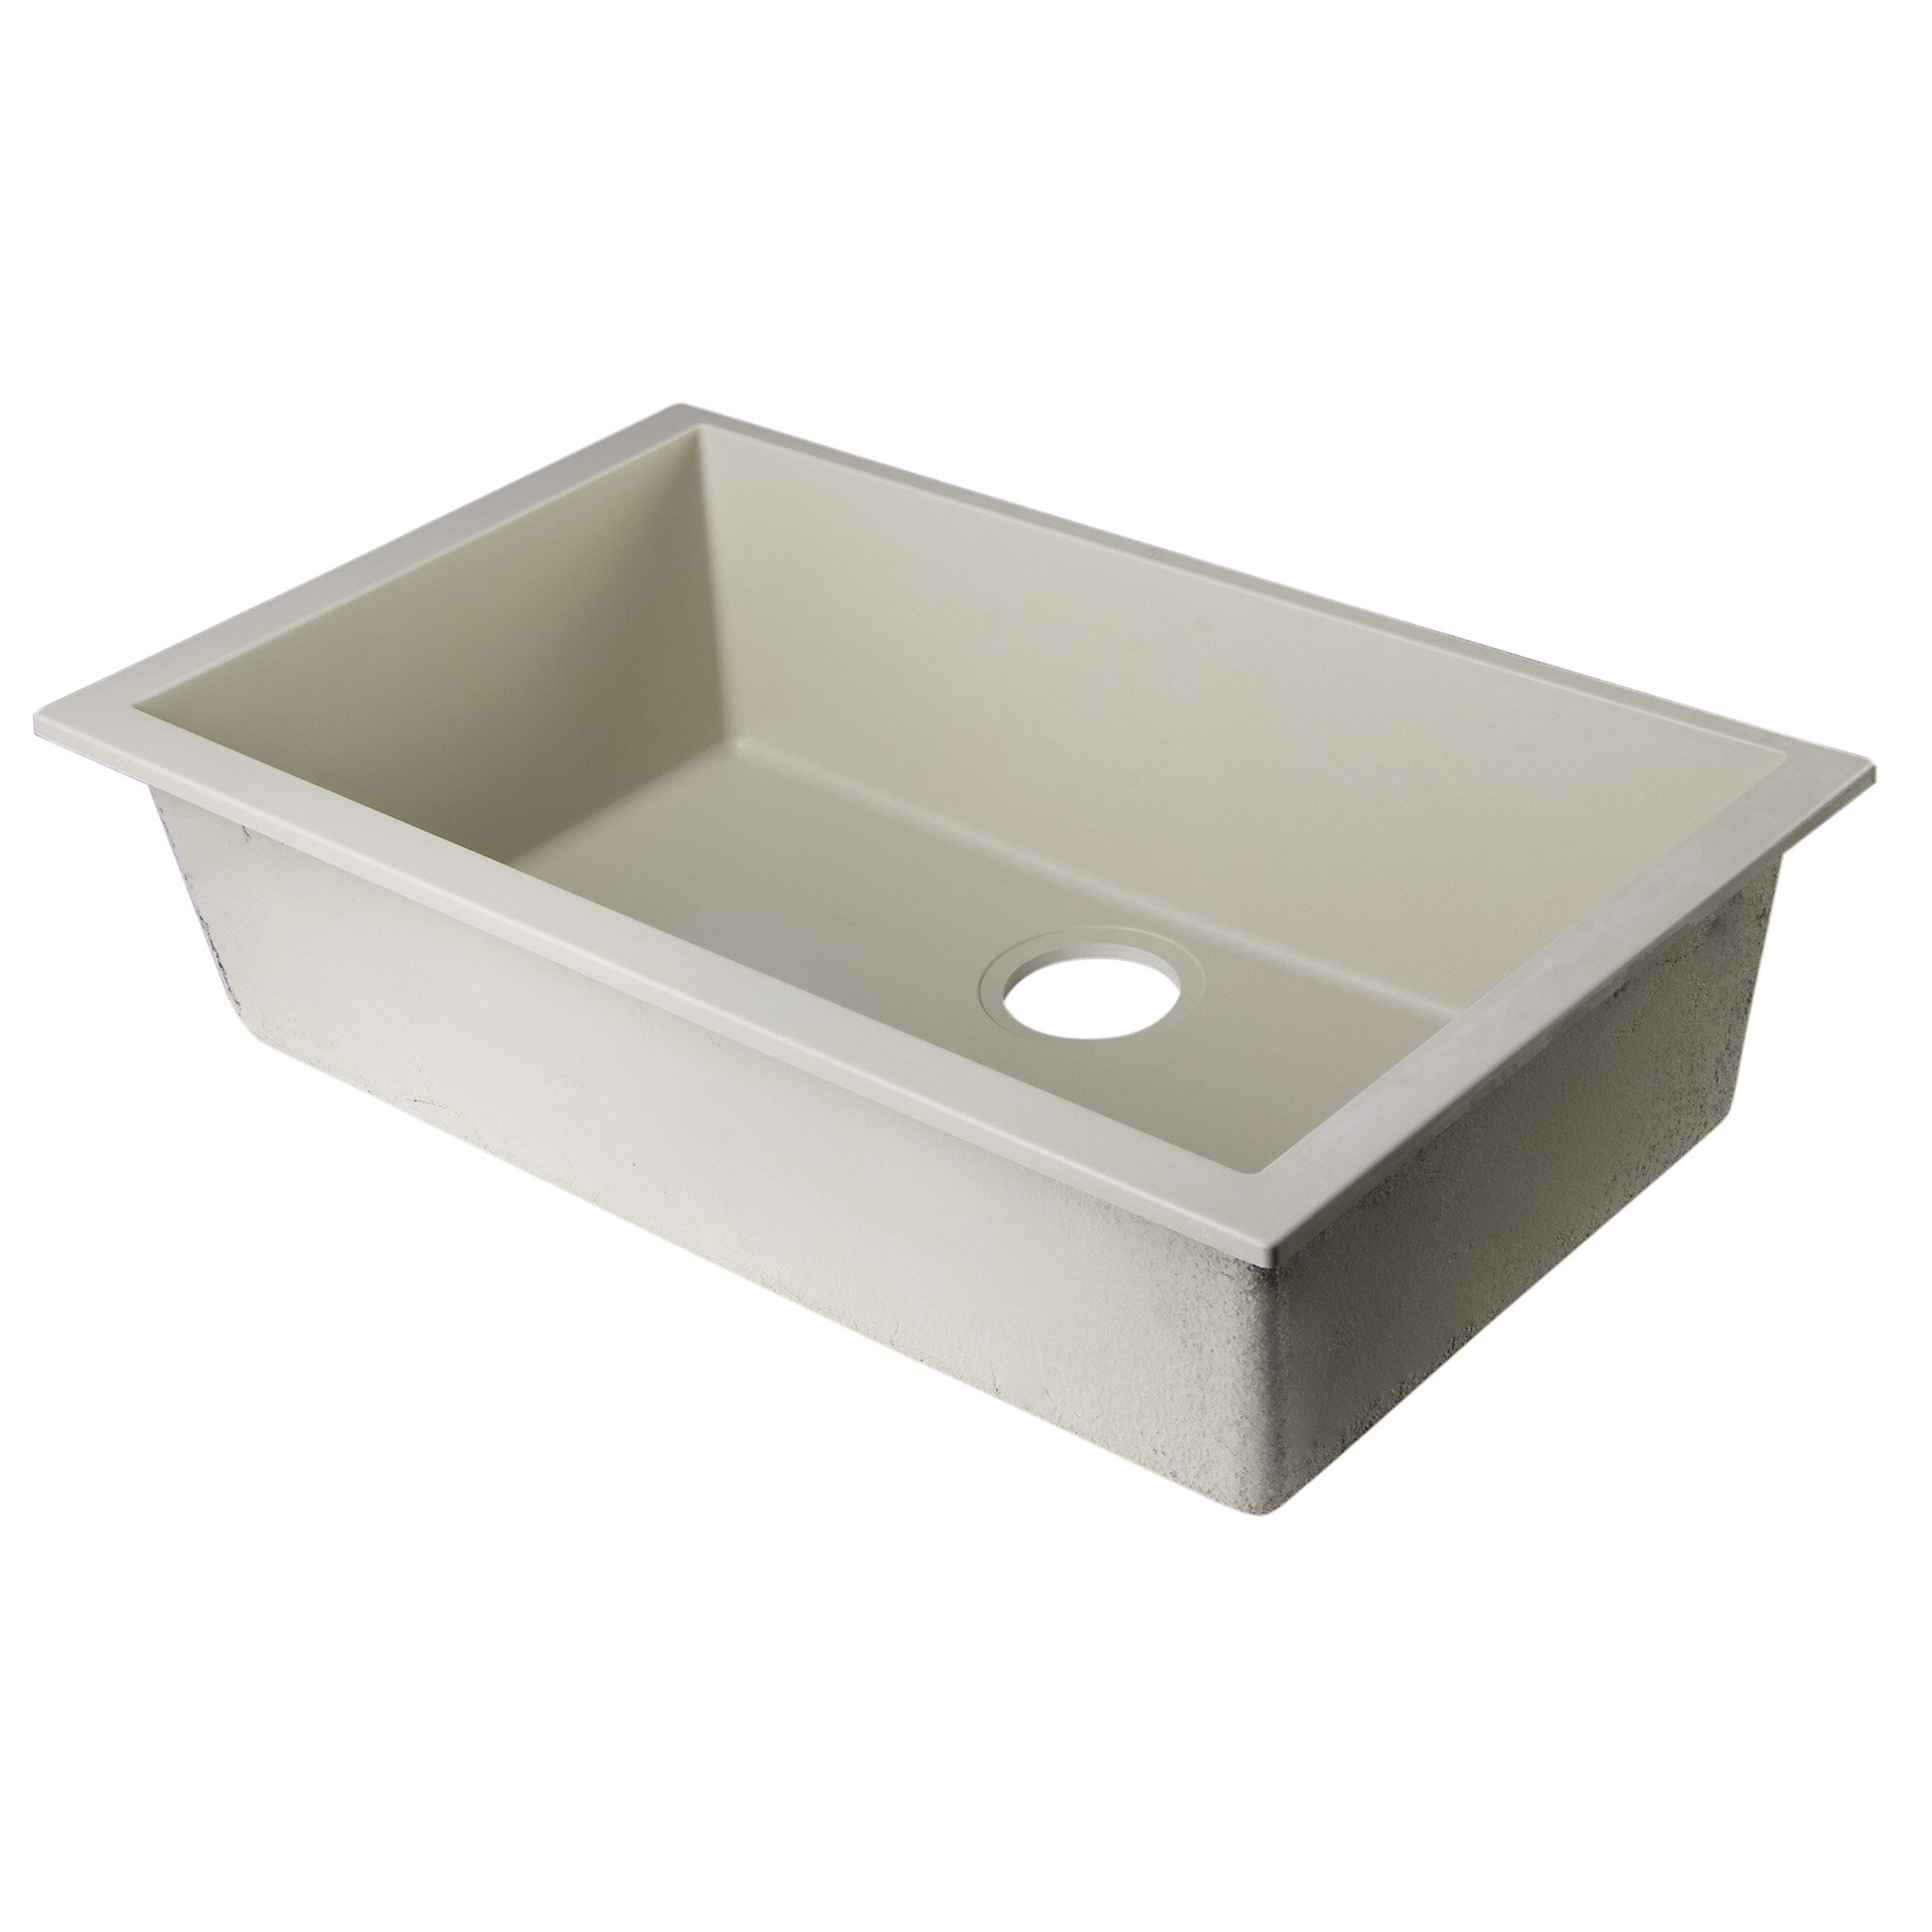 30 undermount kitchen sink island portable alfi brand quot x 17 75 single bowl